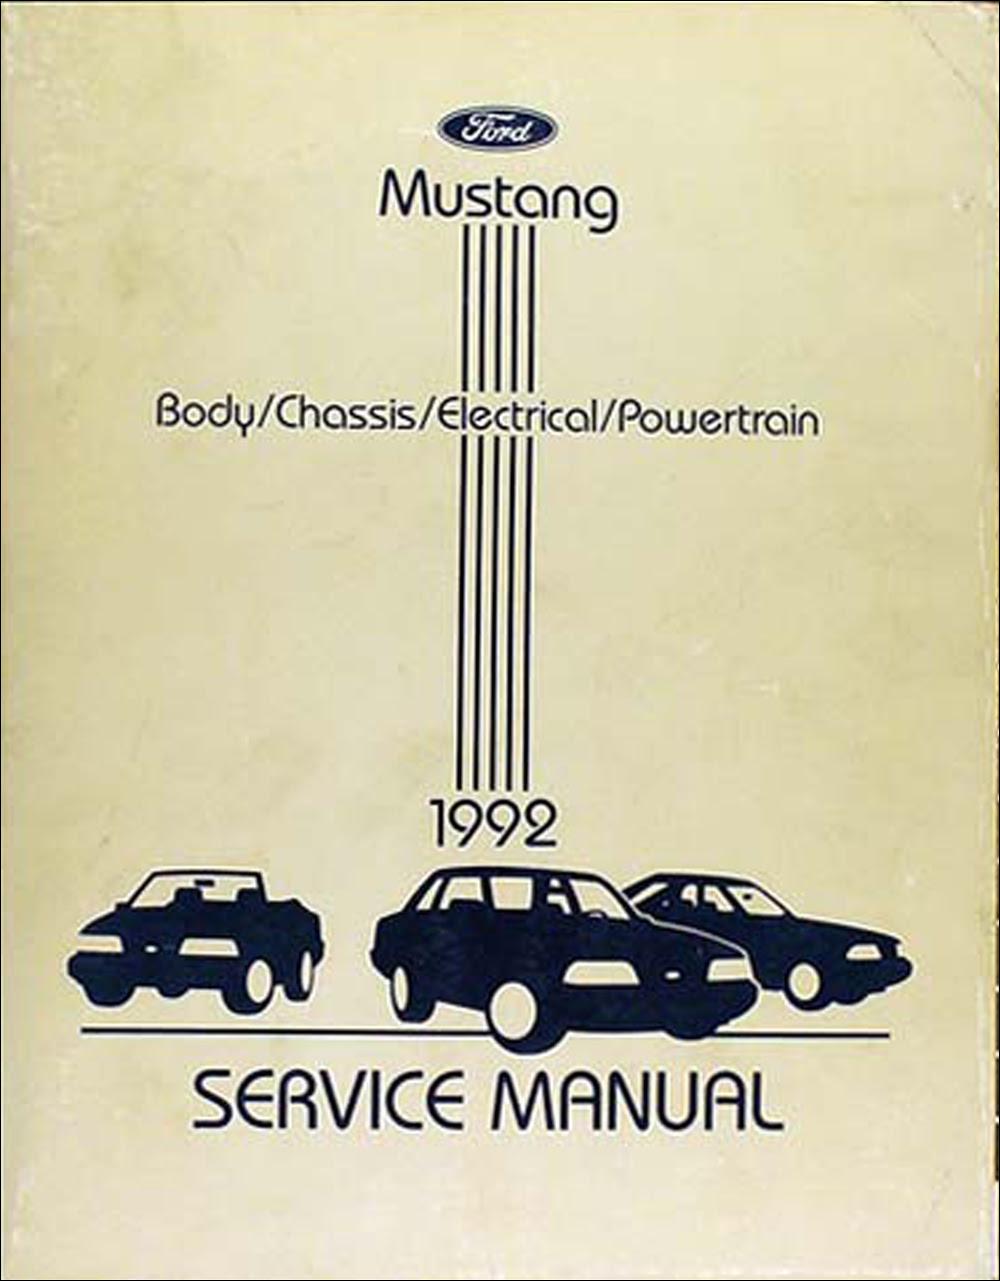 1992 Ford Mustang Factory Foldout Wiring Diagram Original